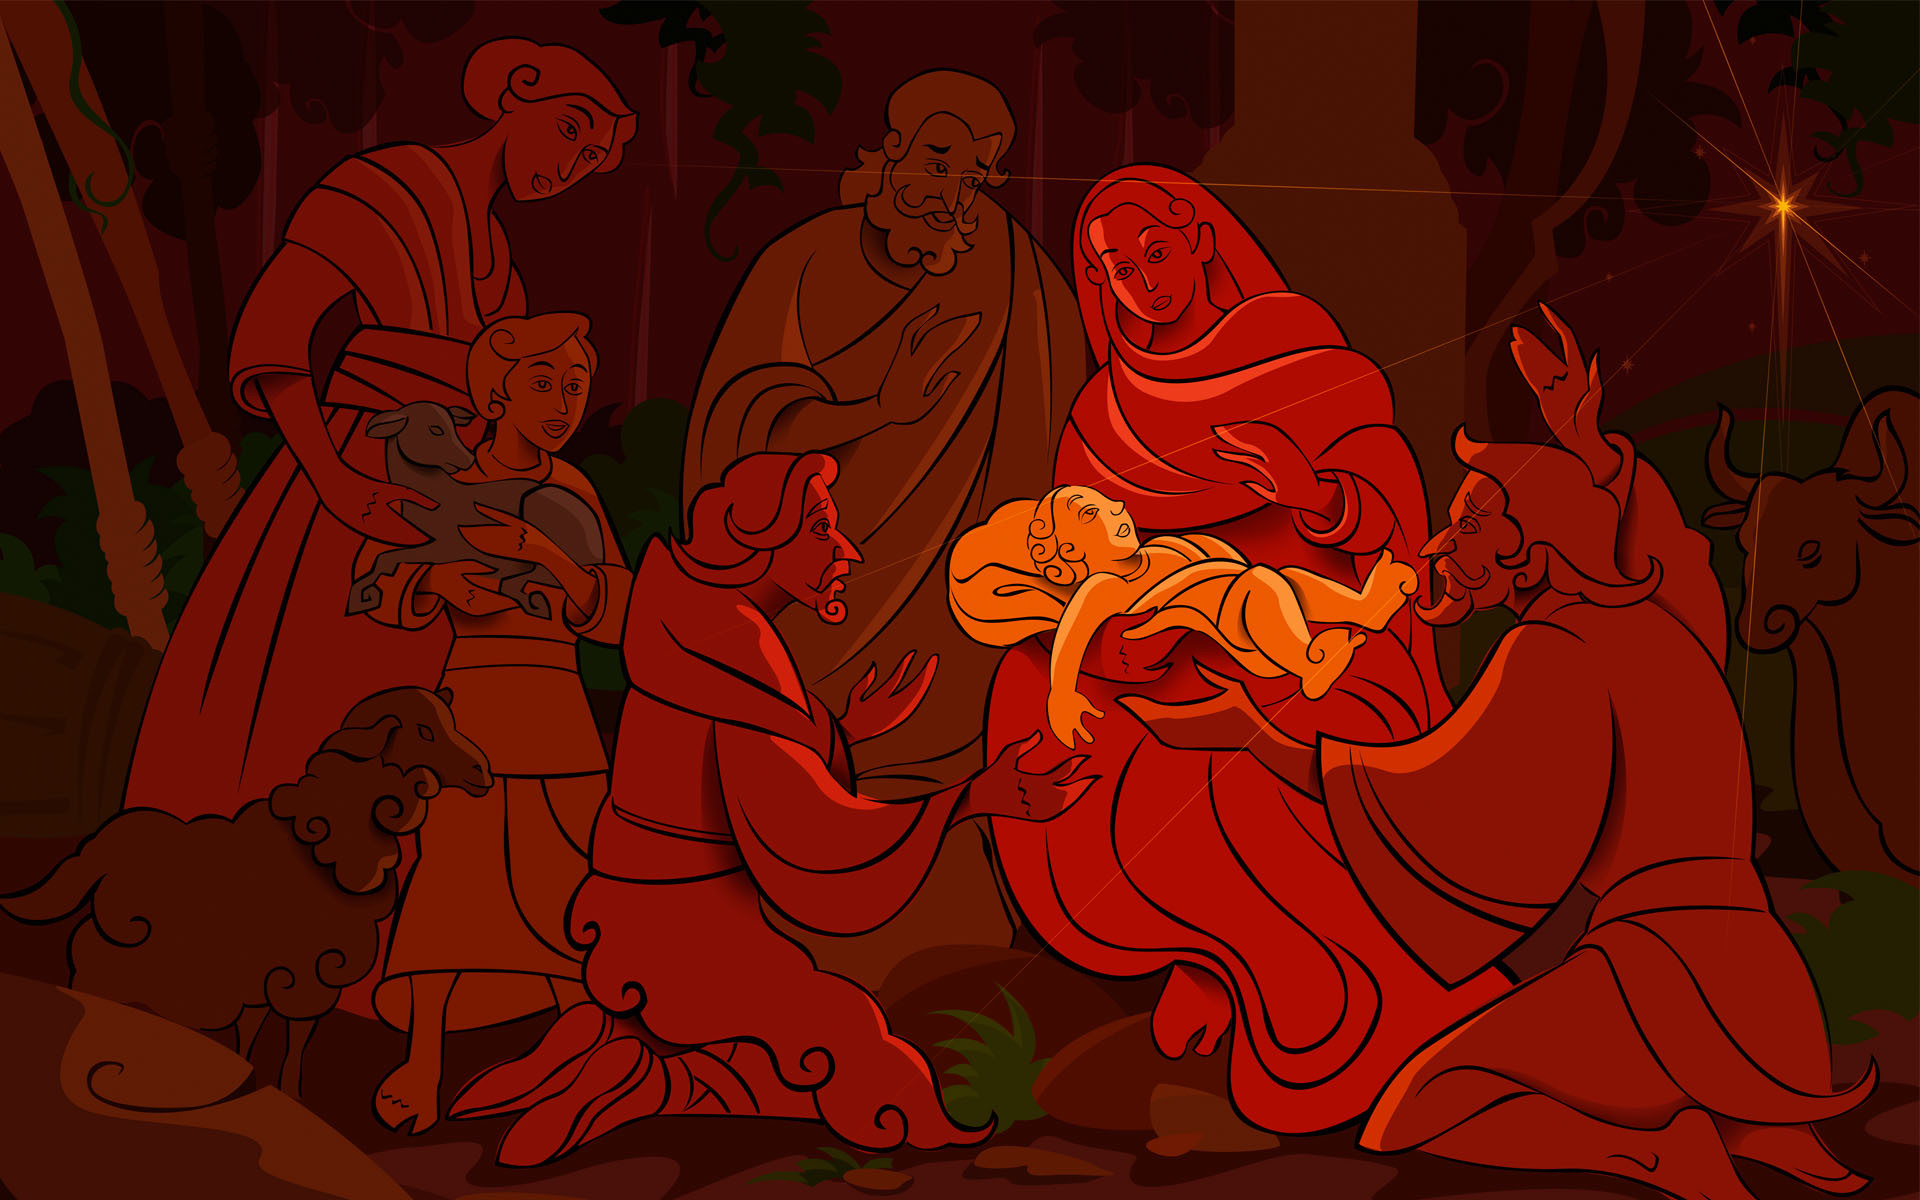 Birth of Christ Celebrations